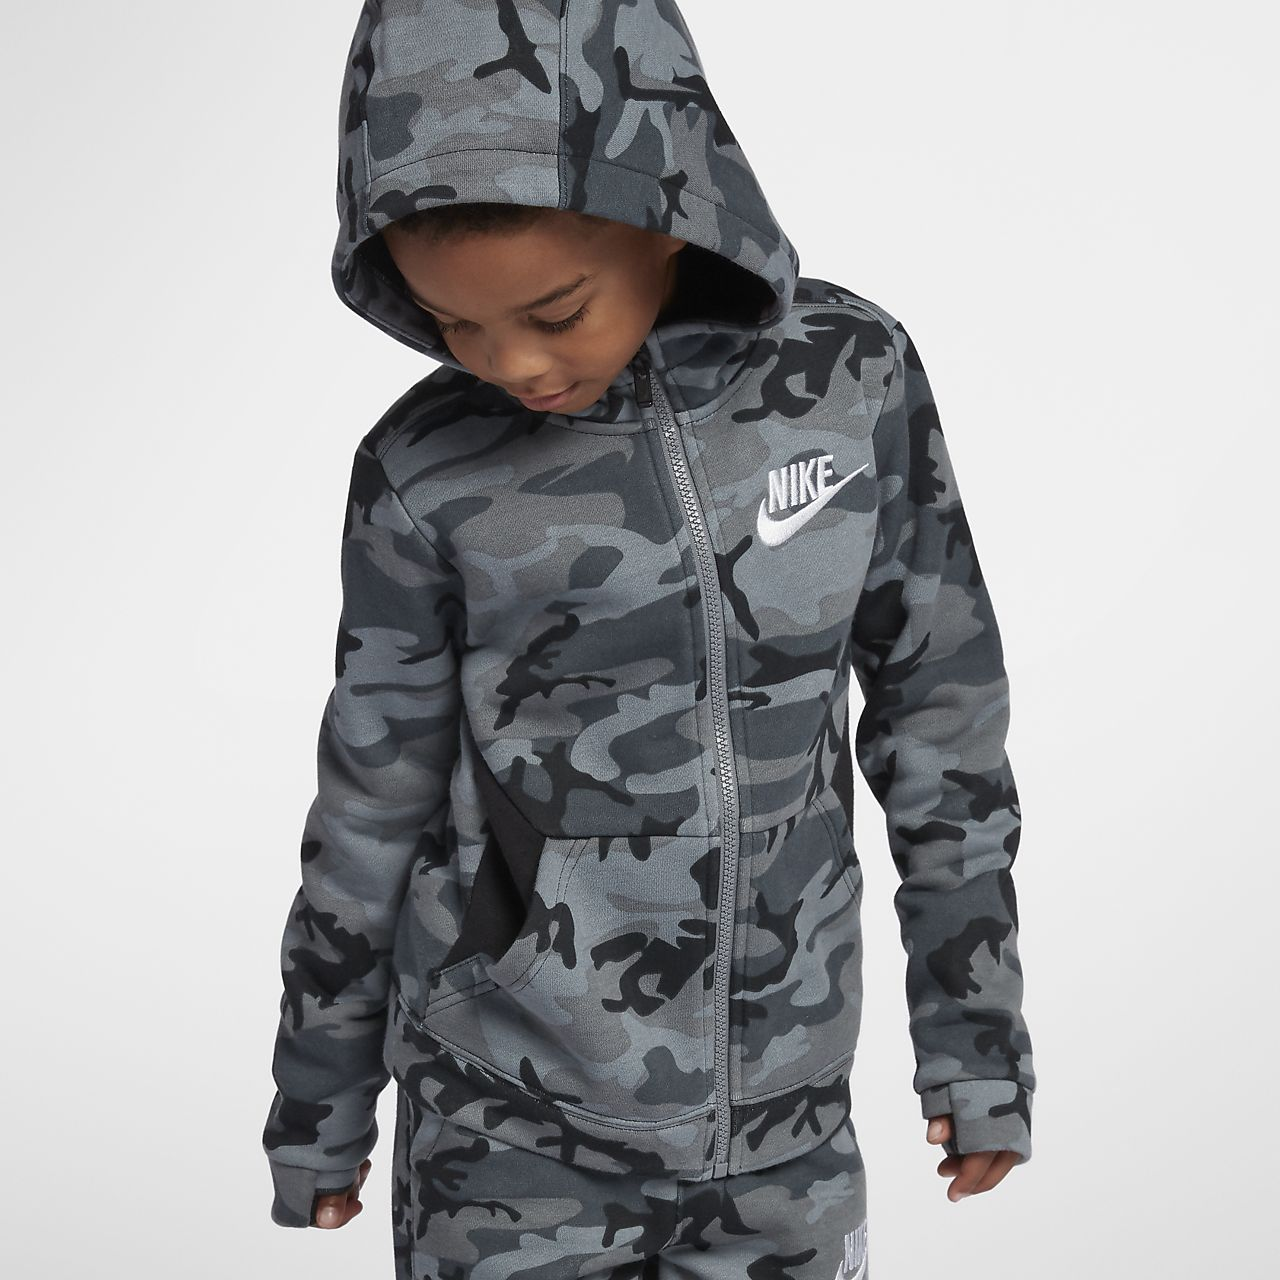 Nike Sportswear Club Fleece Dessuadora amb caputxa - Nen/a petit/a